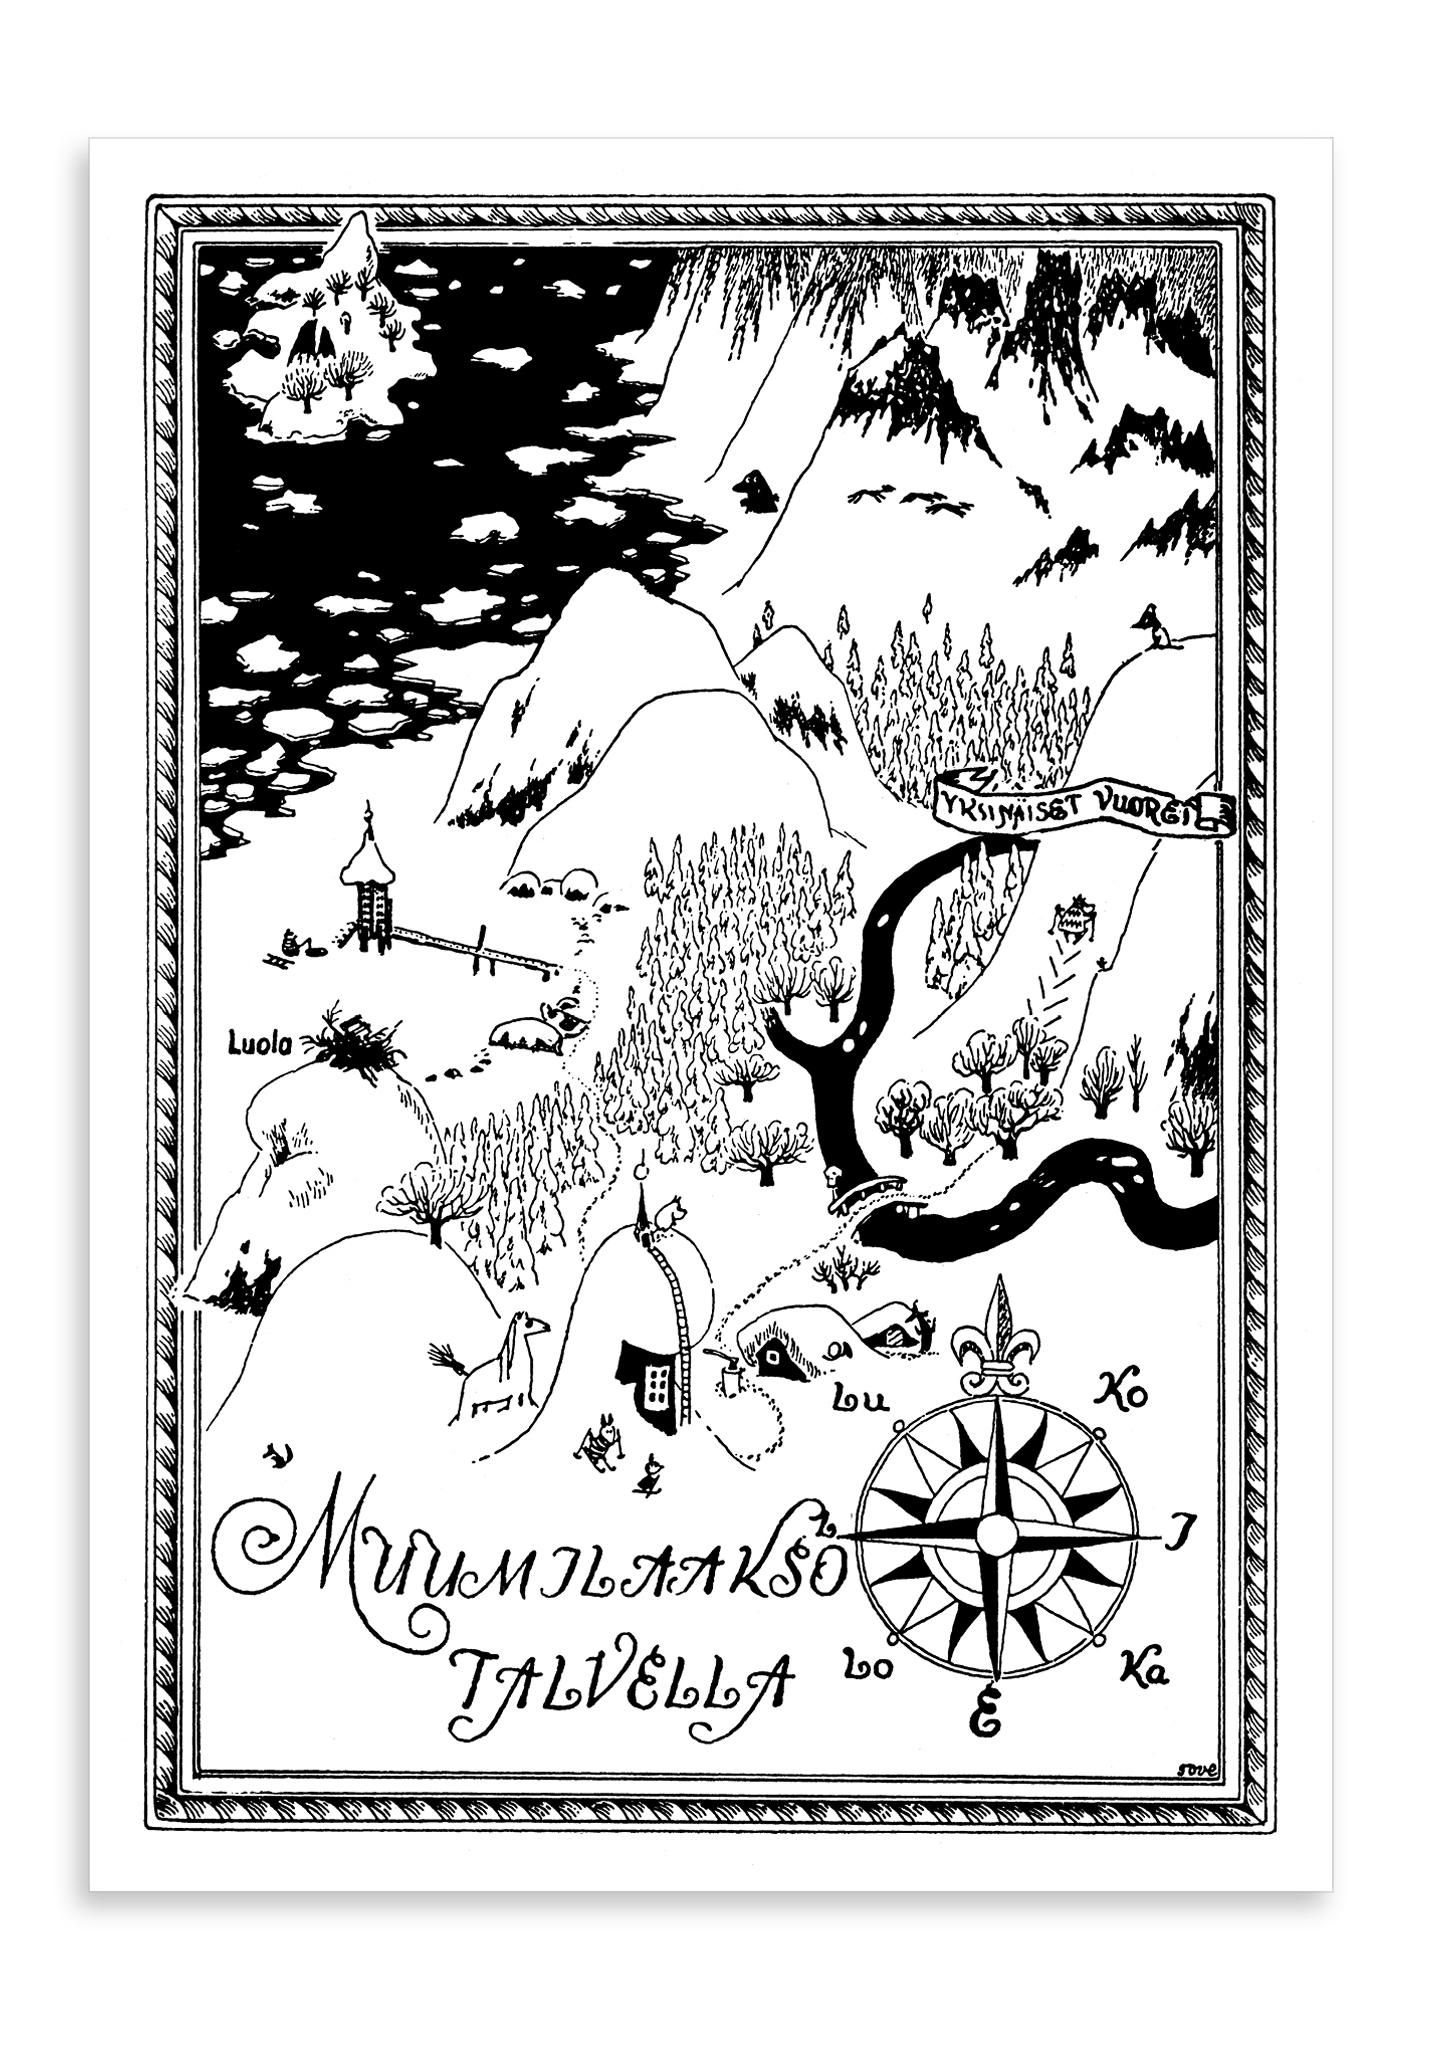 Putinki Postcard Muumilaakso talvella